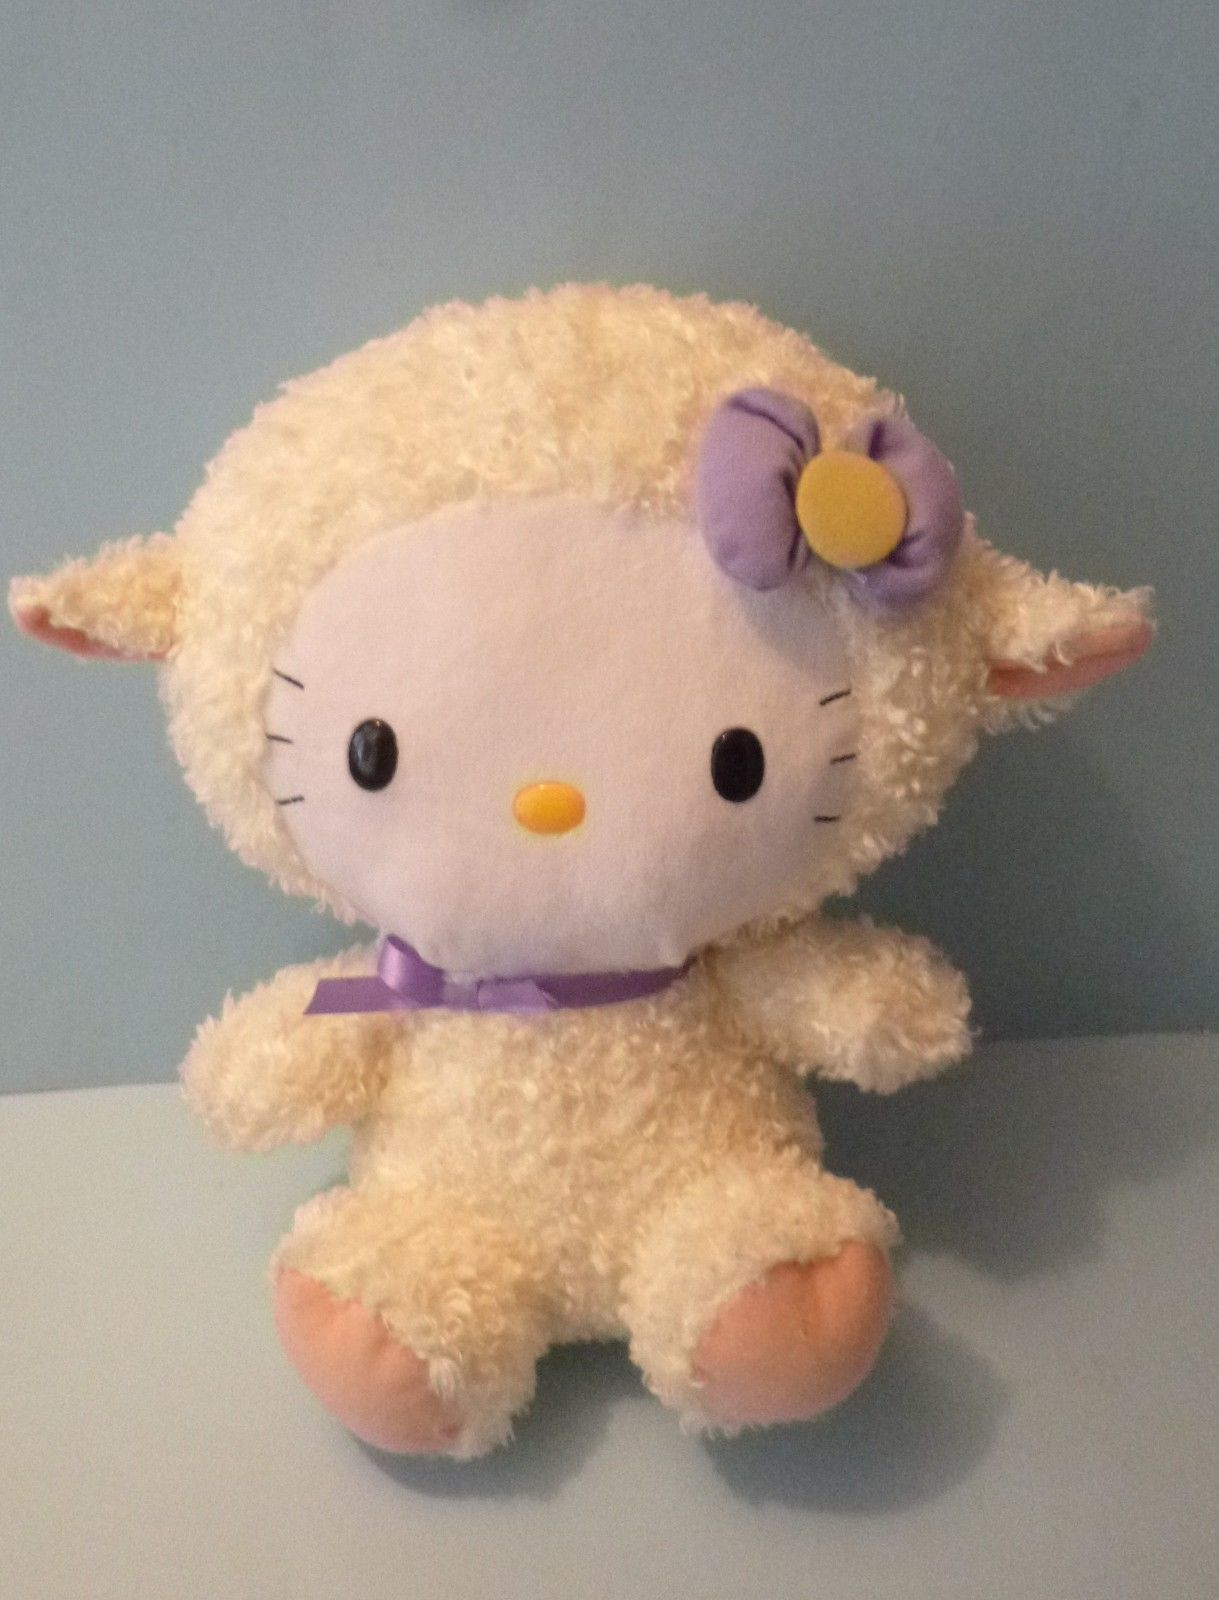 323053f9d25 TY Beanie Buddy Sanrio Hello Kitty Purple Lamb Sheep Stuffed Animal Plush  12